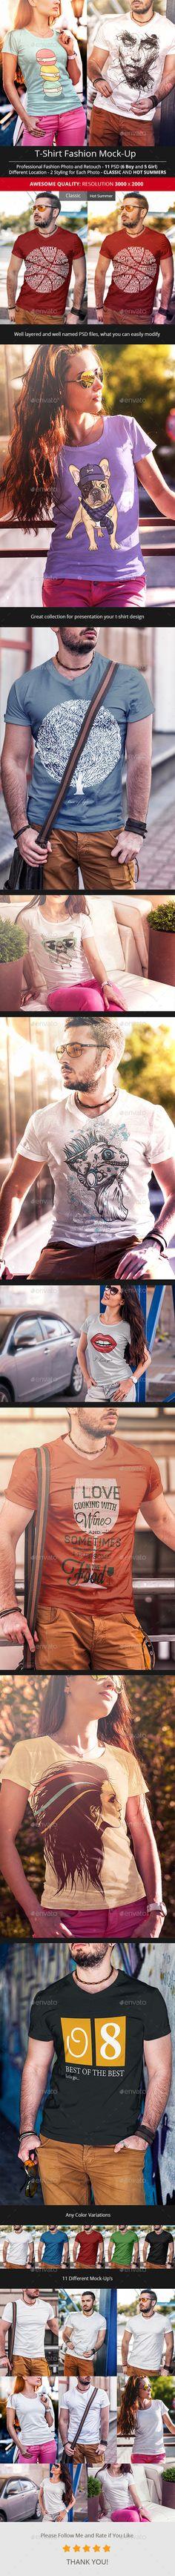 T-Shirt Fashion Mock-Up #design Download: http://graphicriver.net/item/tshirt-fashion-mockup/11725001?ref=ksioks